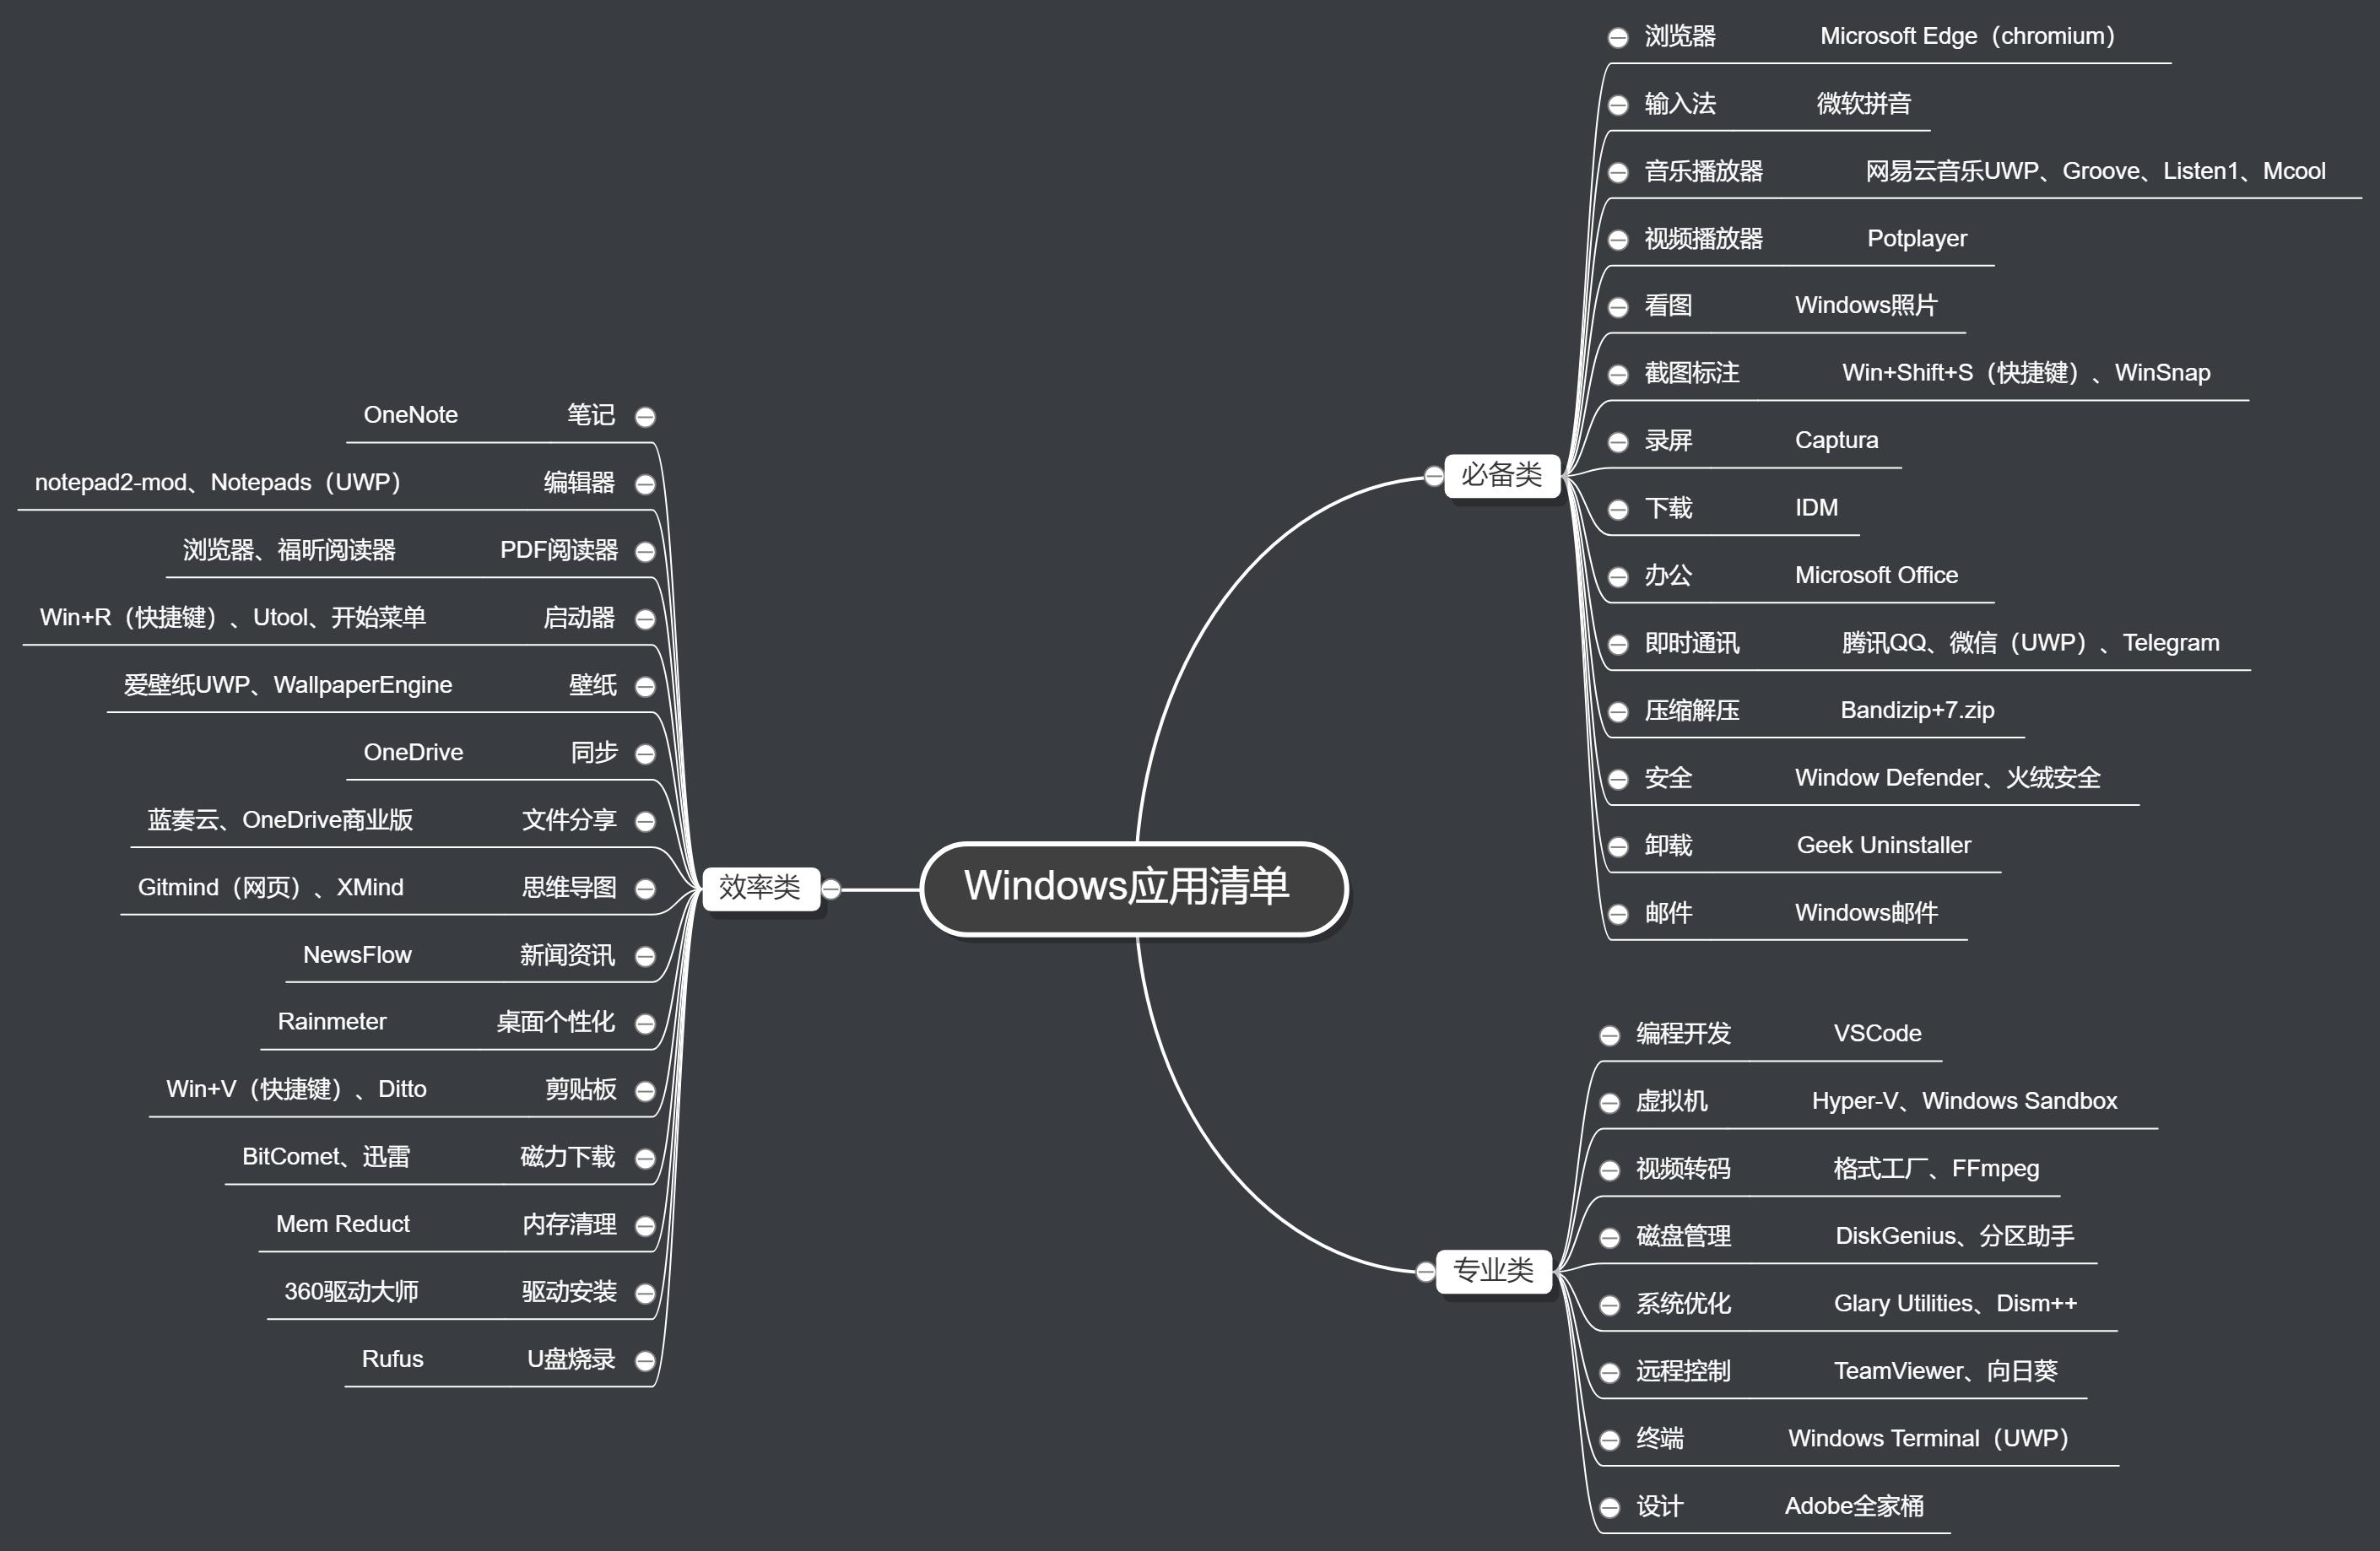 Dream Maker 2020年度应用清单导图